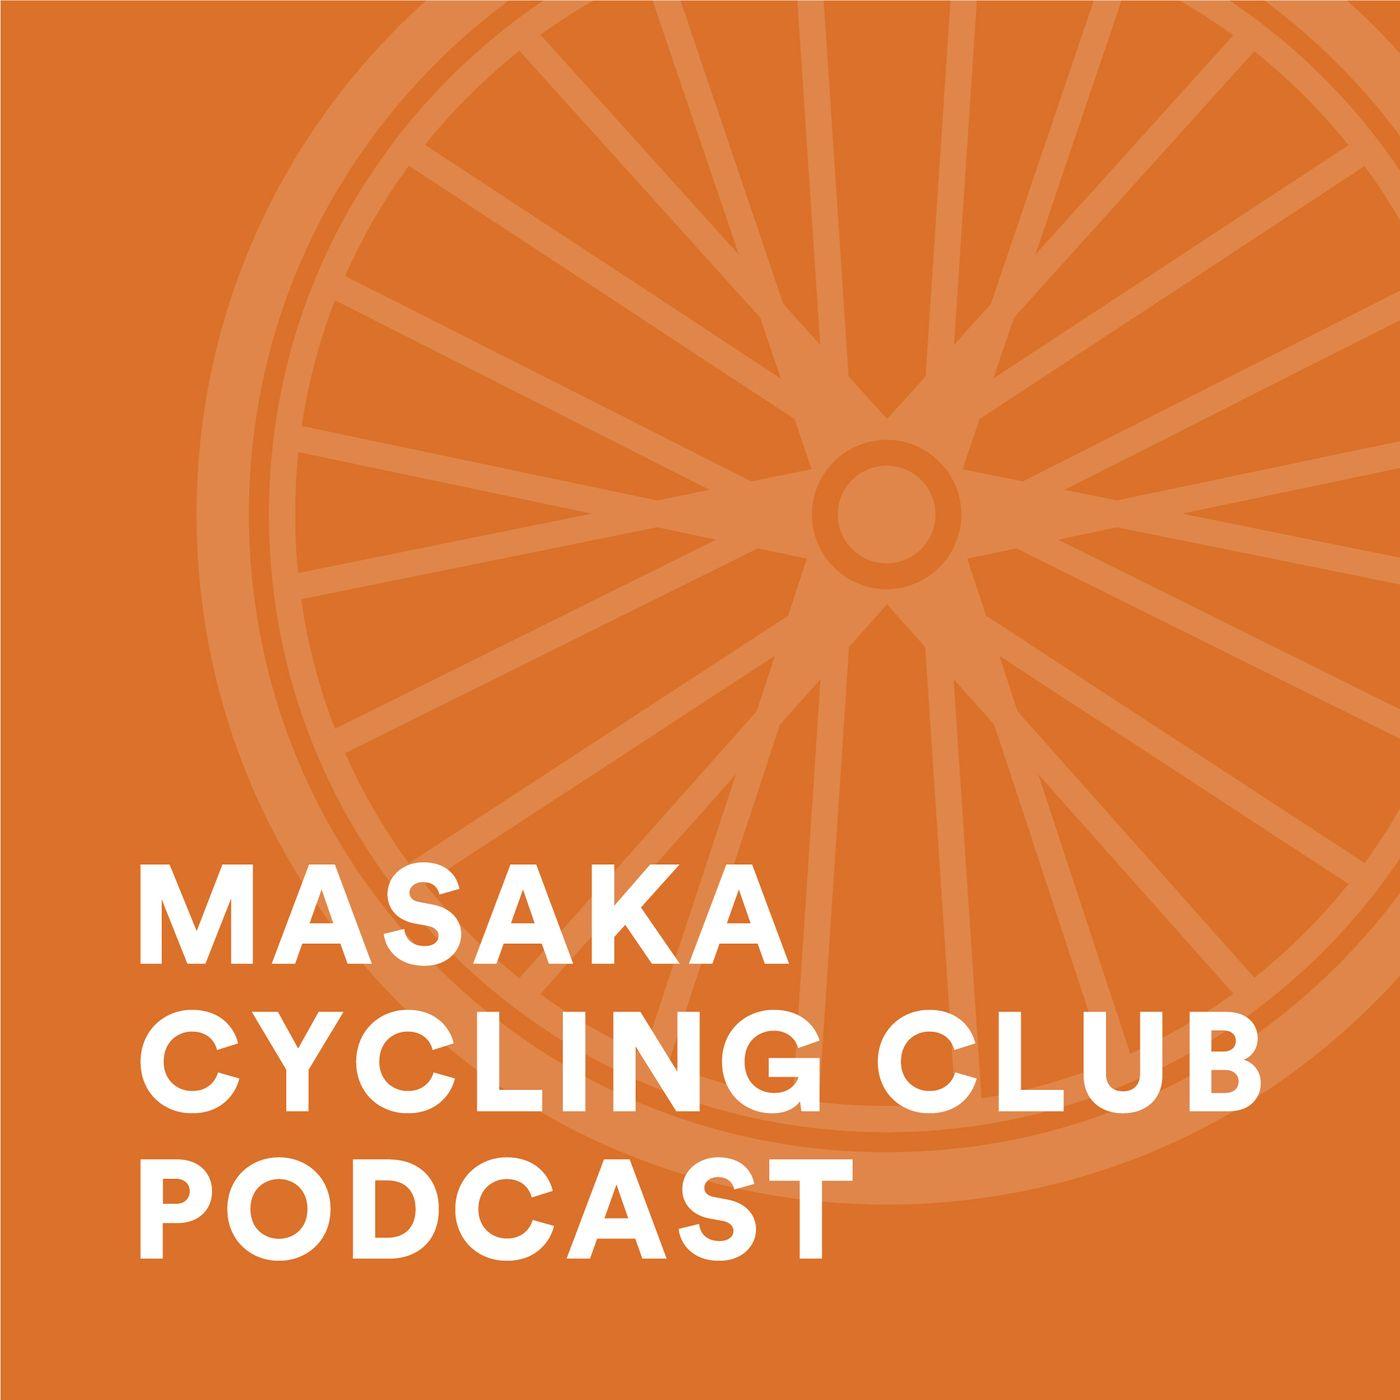 Ep9: Mikel Delagrange - Amani Project & Masaka Cycling Club Update